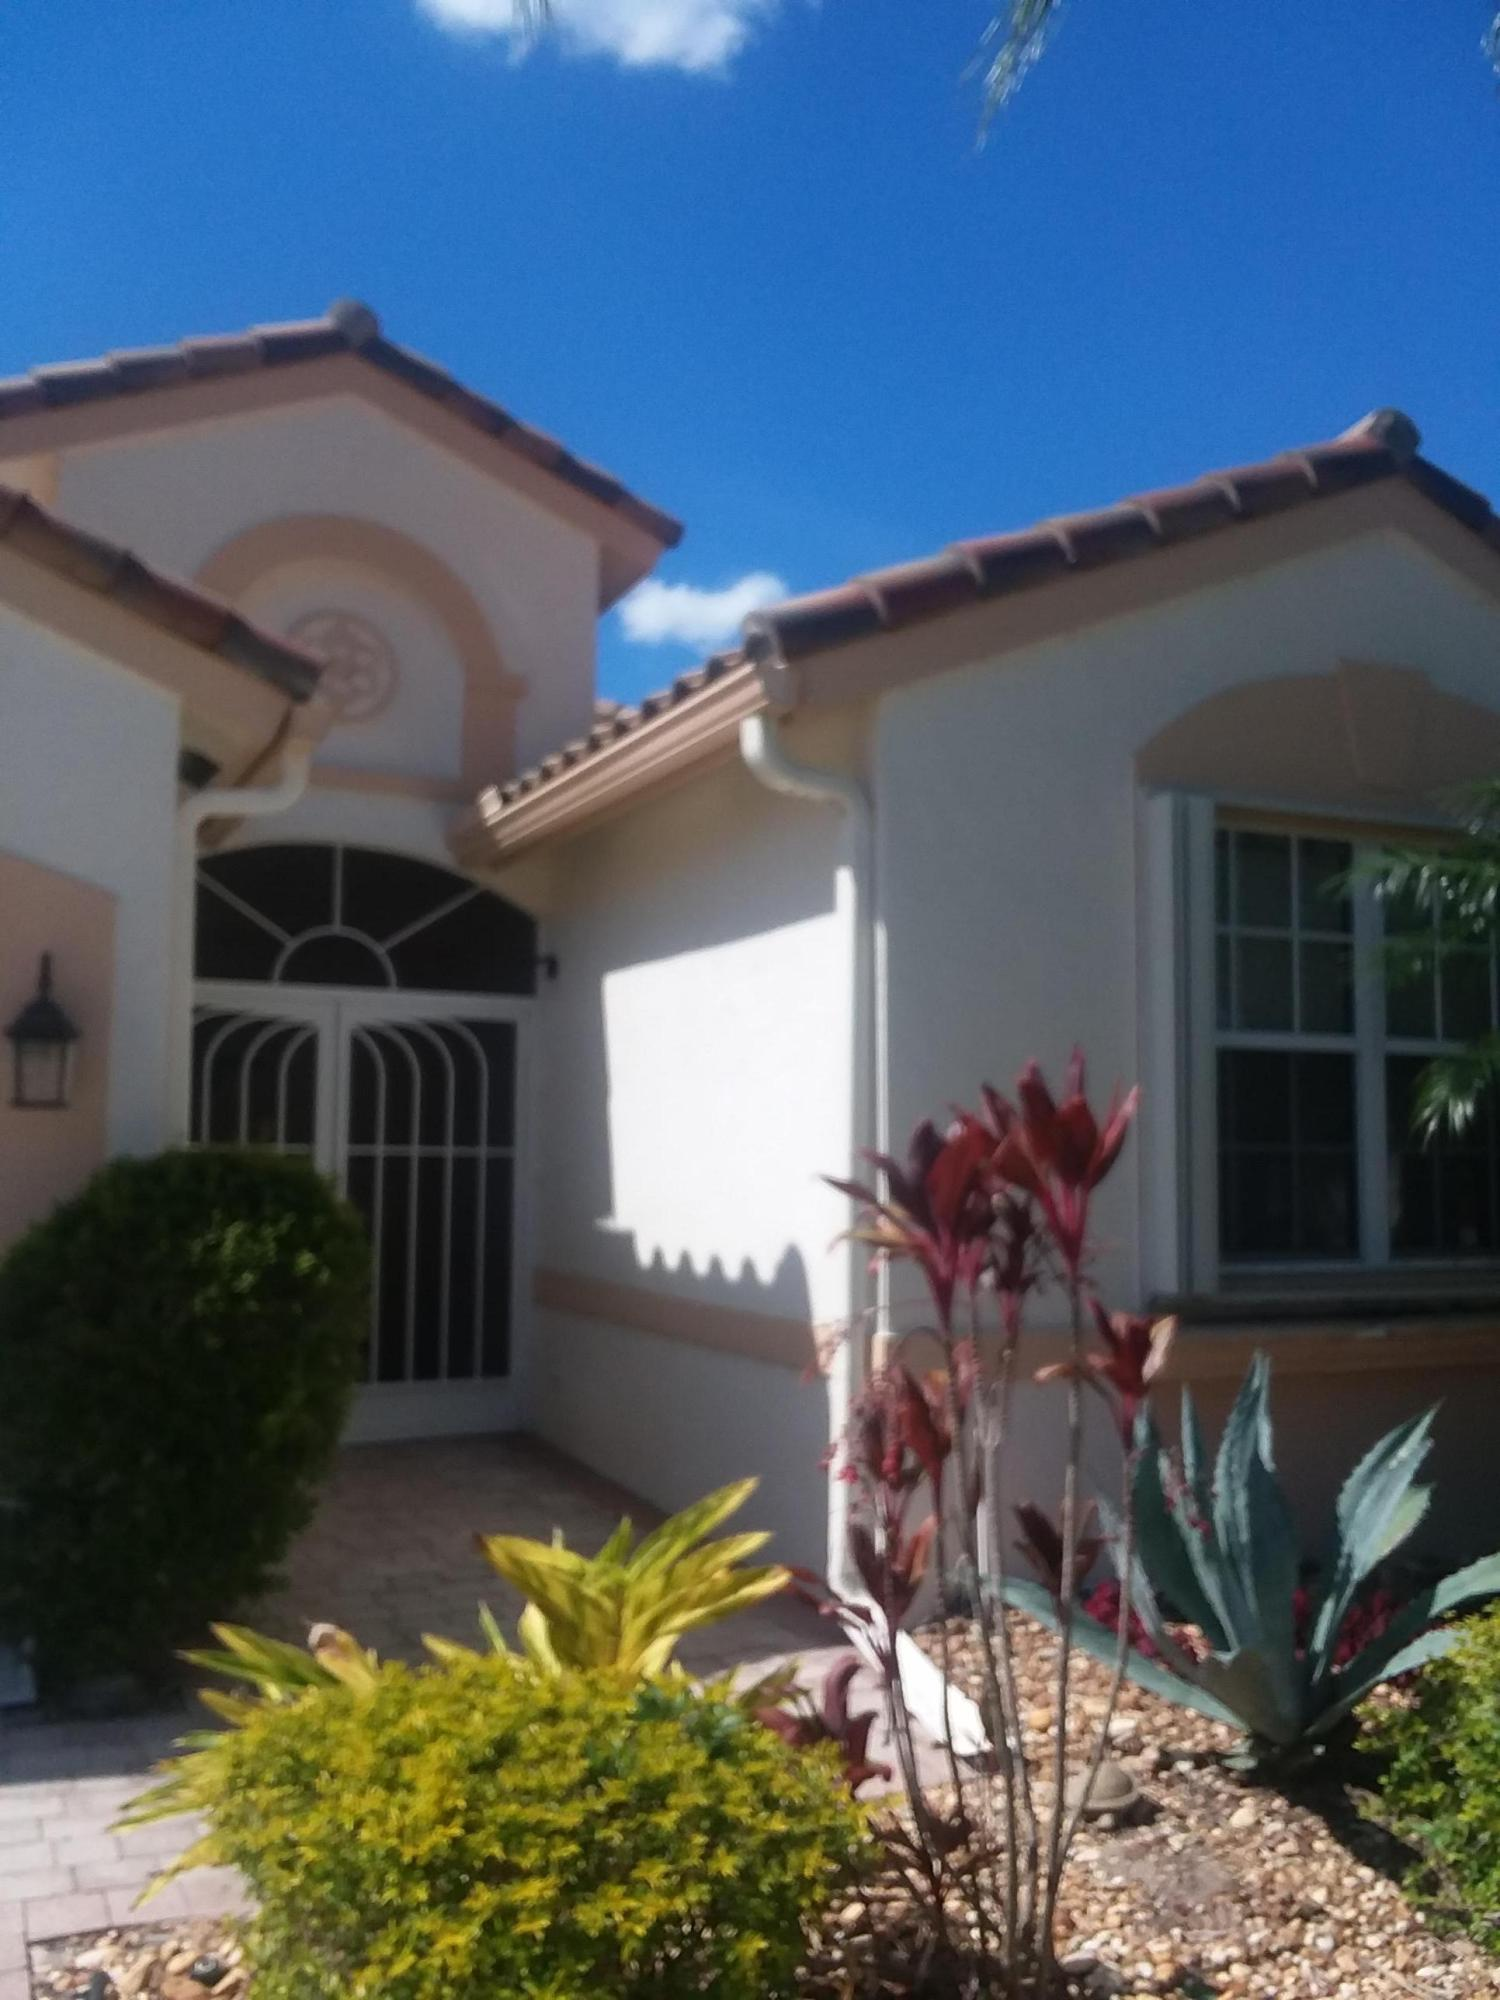 9269 Vercelli Street, Lake Worth, Florida 33467, 2 Bedrooms Bedrooms, ,2 BathroomsBathrooms,A,Single family,Vercelli,RX-10524527